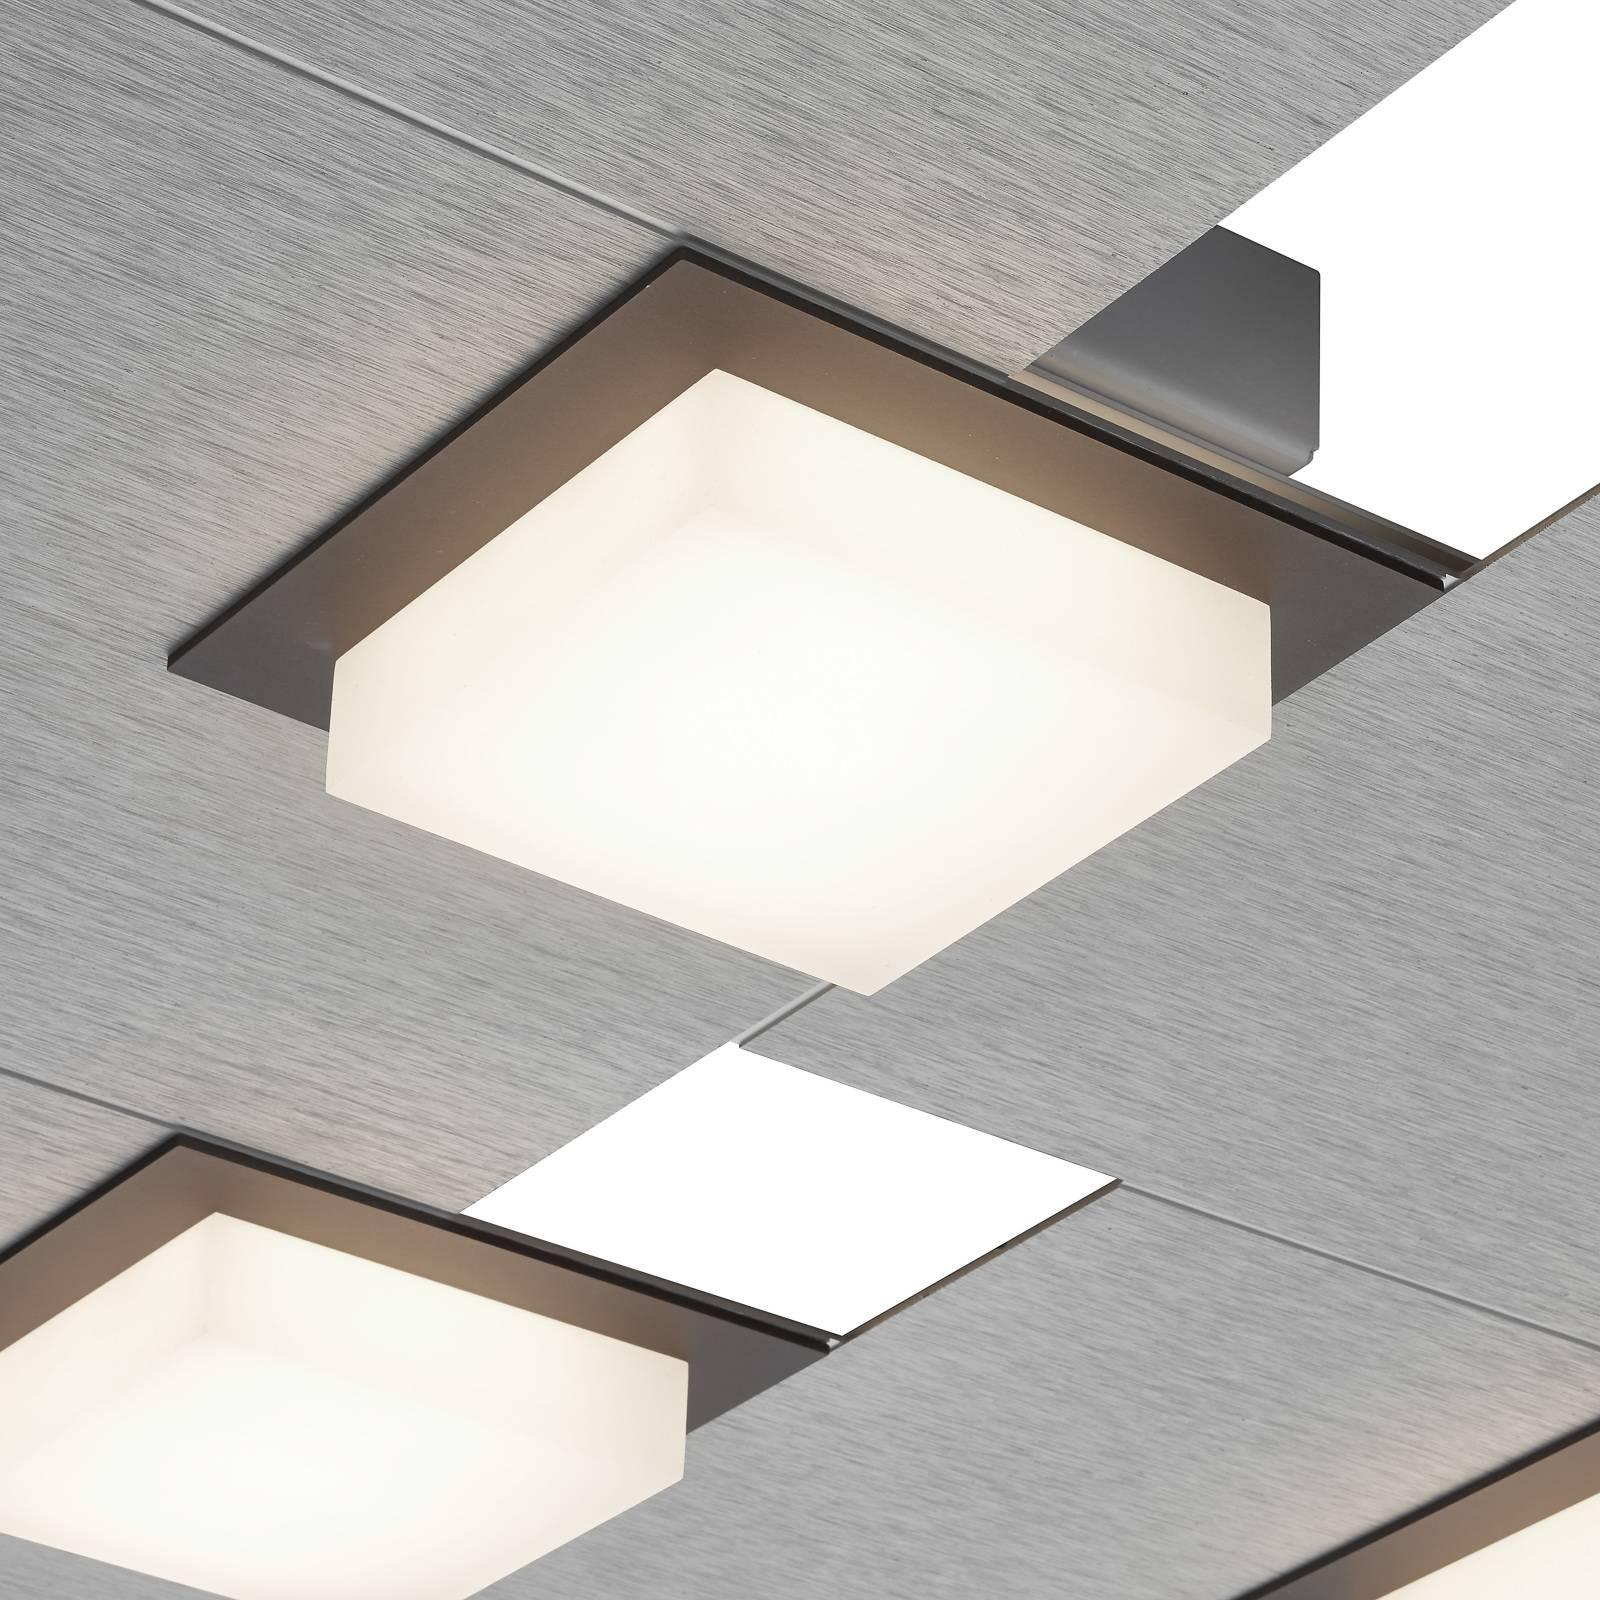 BANKAMP Quadro LED-kattovalaisin 64W, hopea